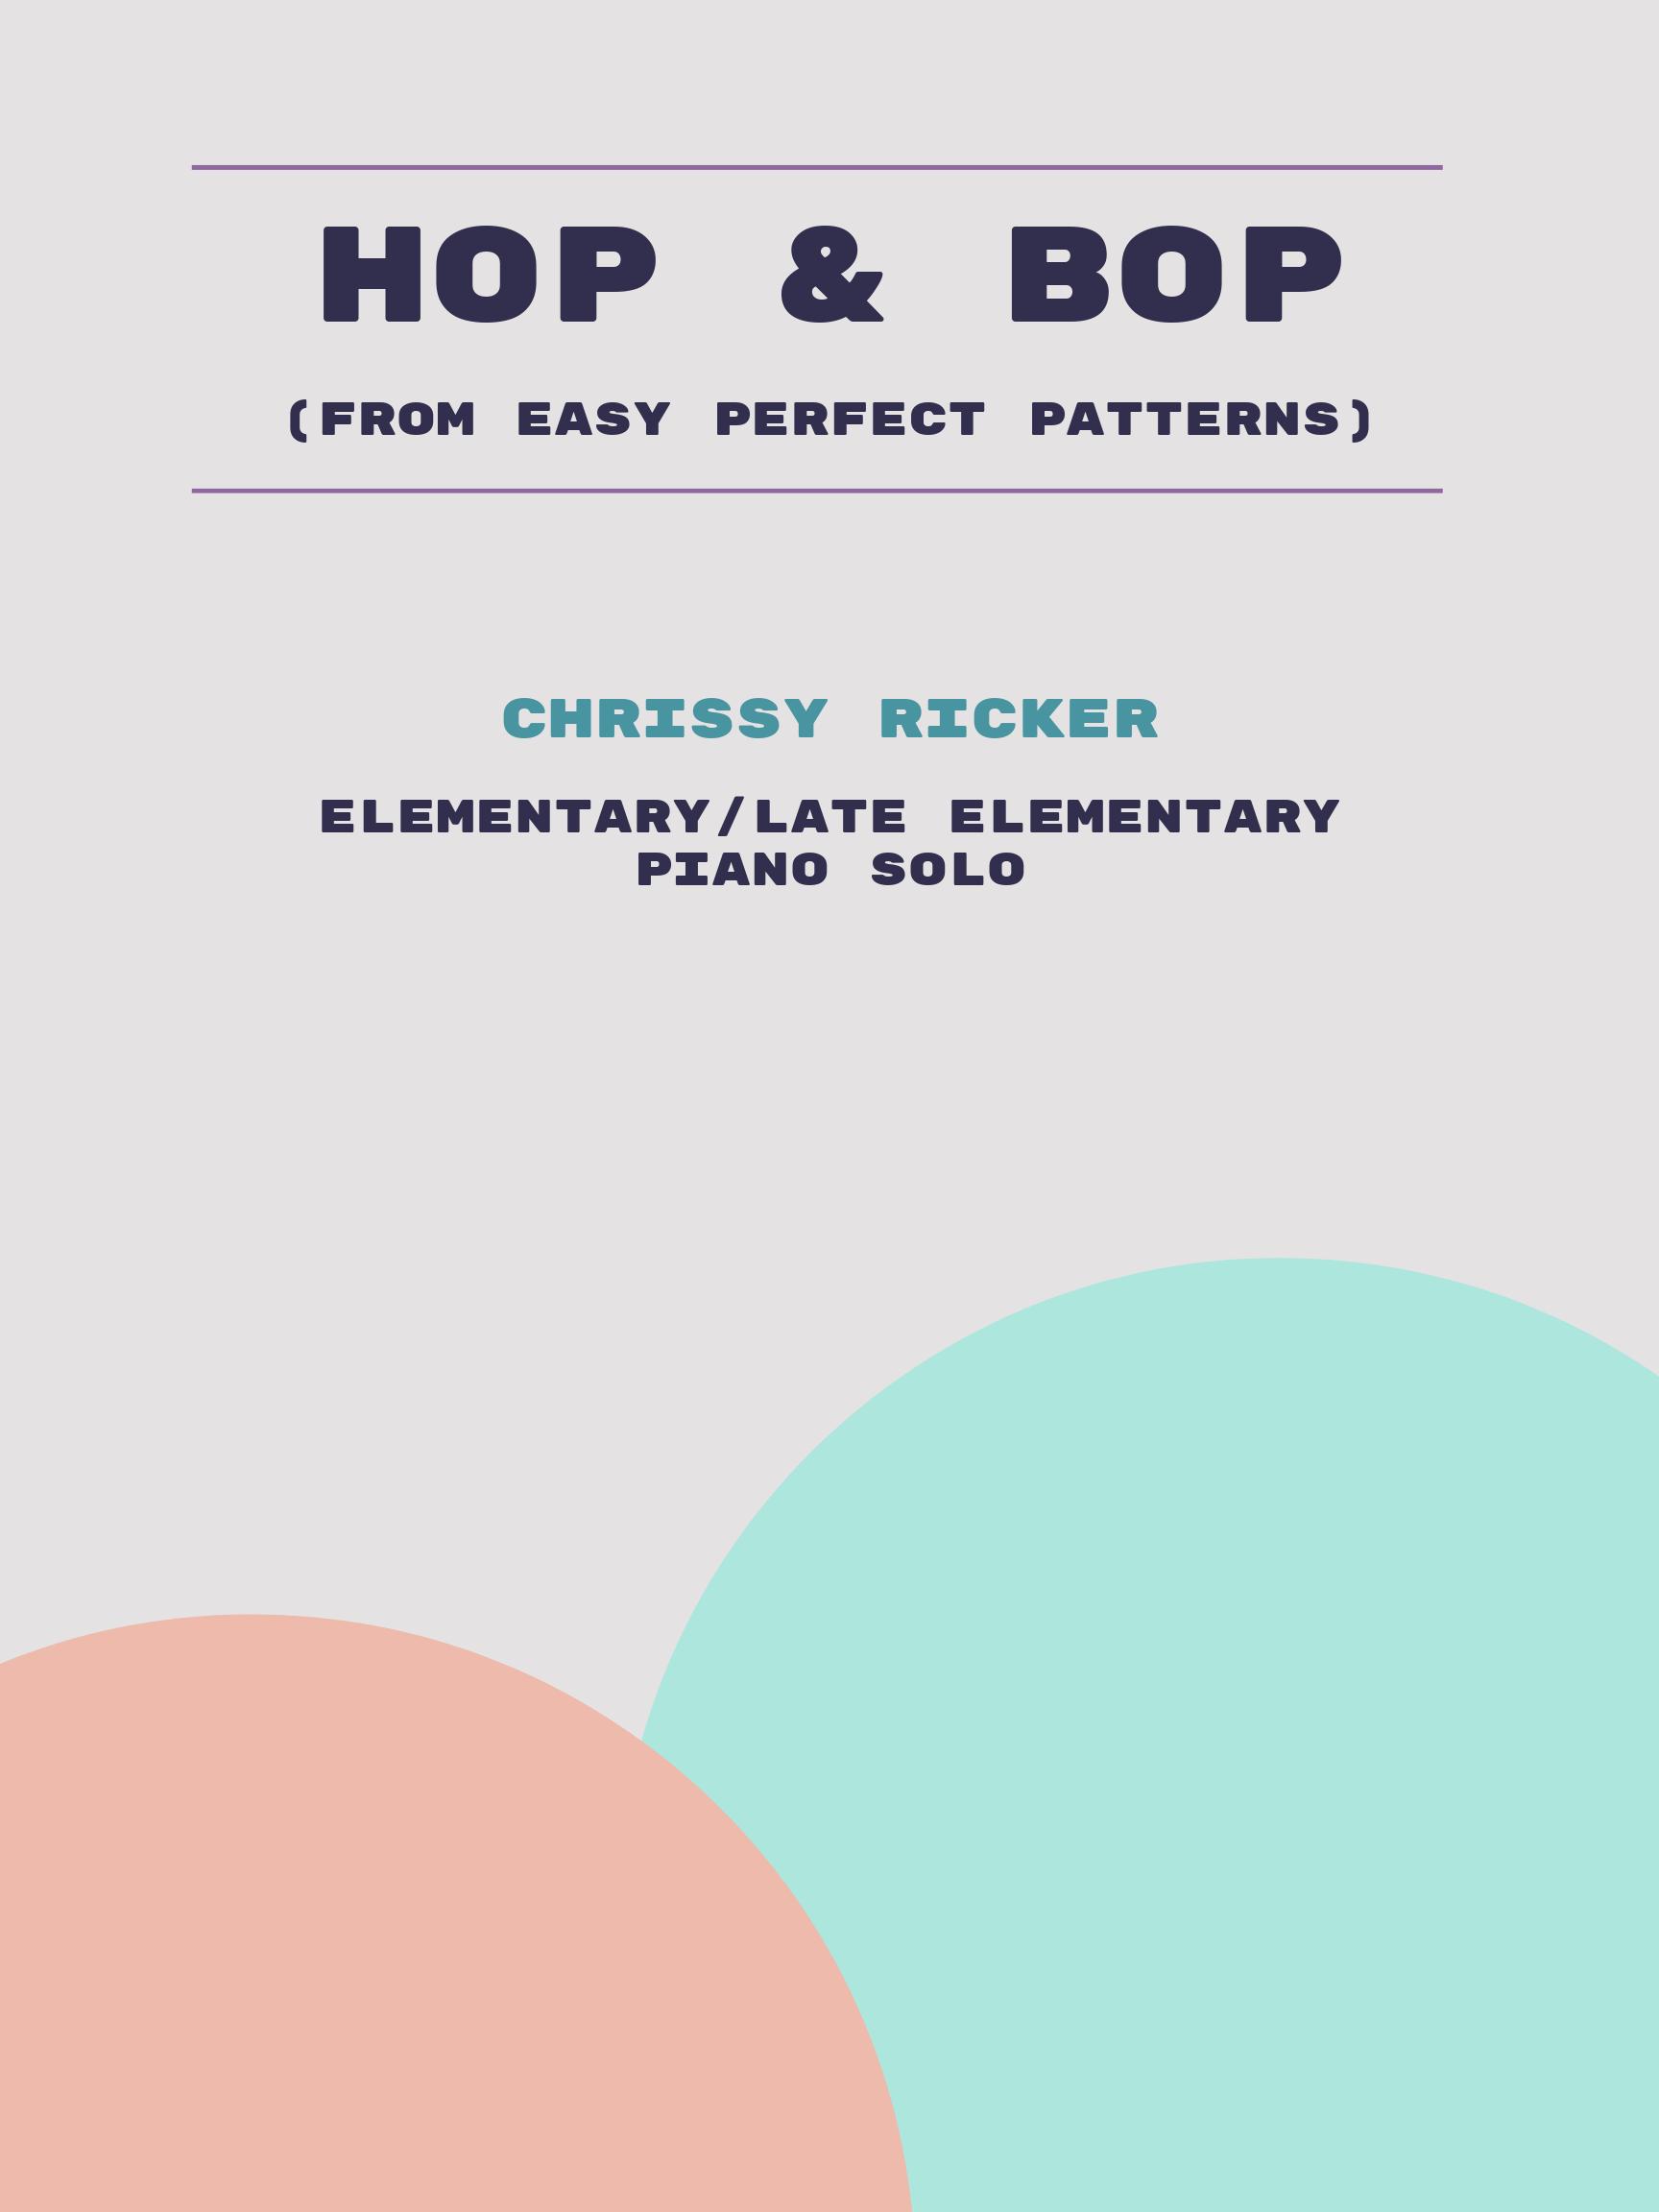 Hop & Bop by Chrissy Ricker